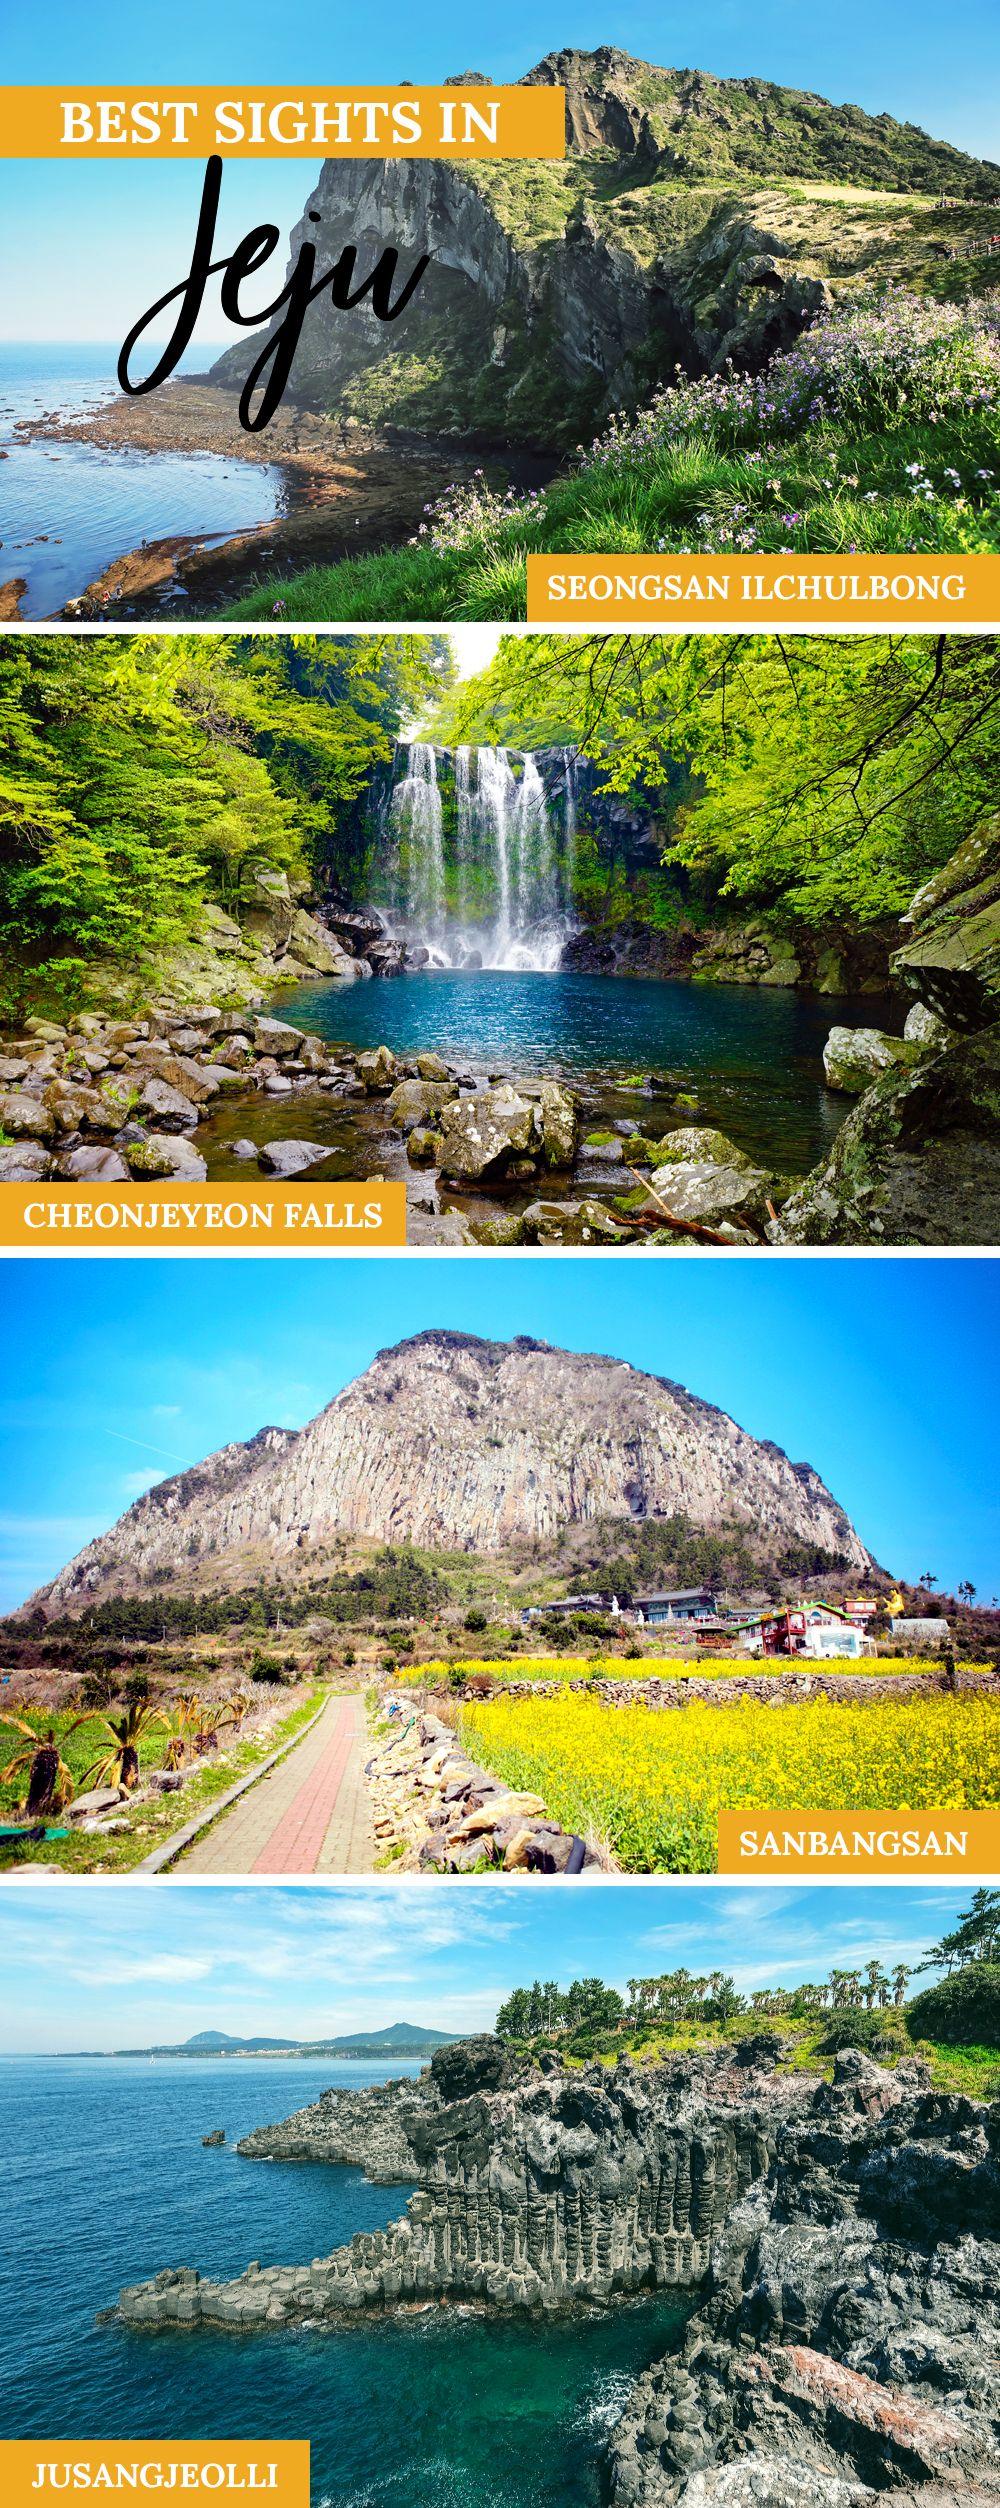 5 days in Jeju, South Korea